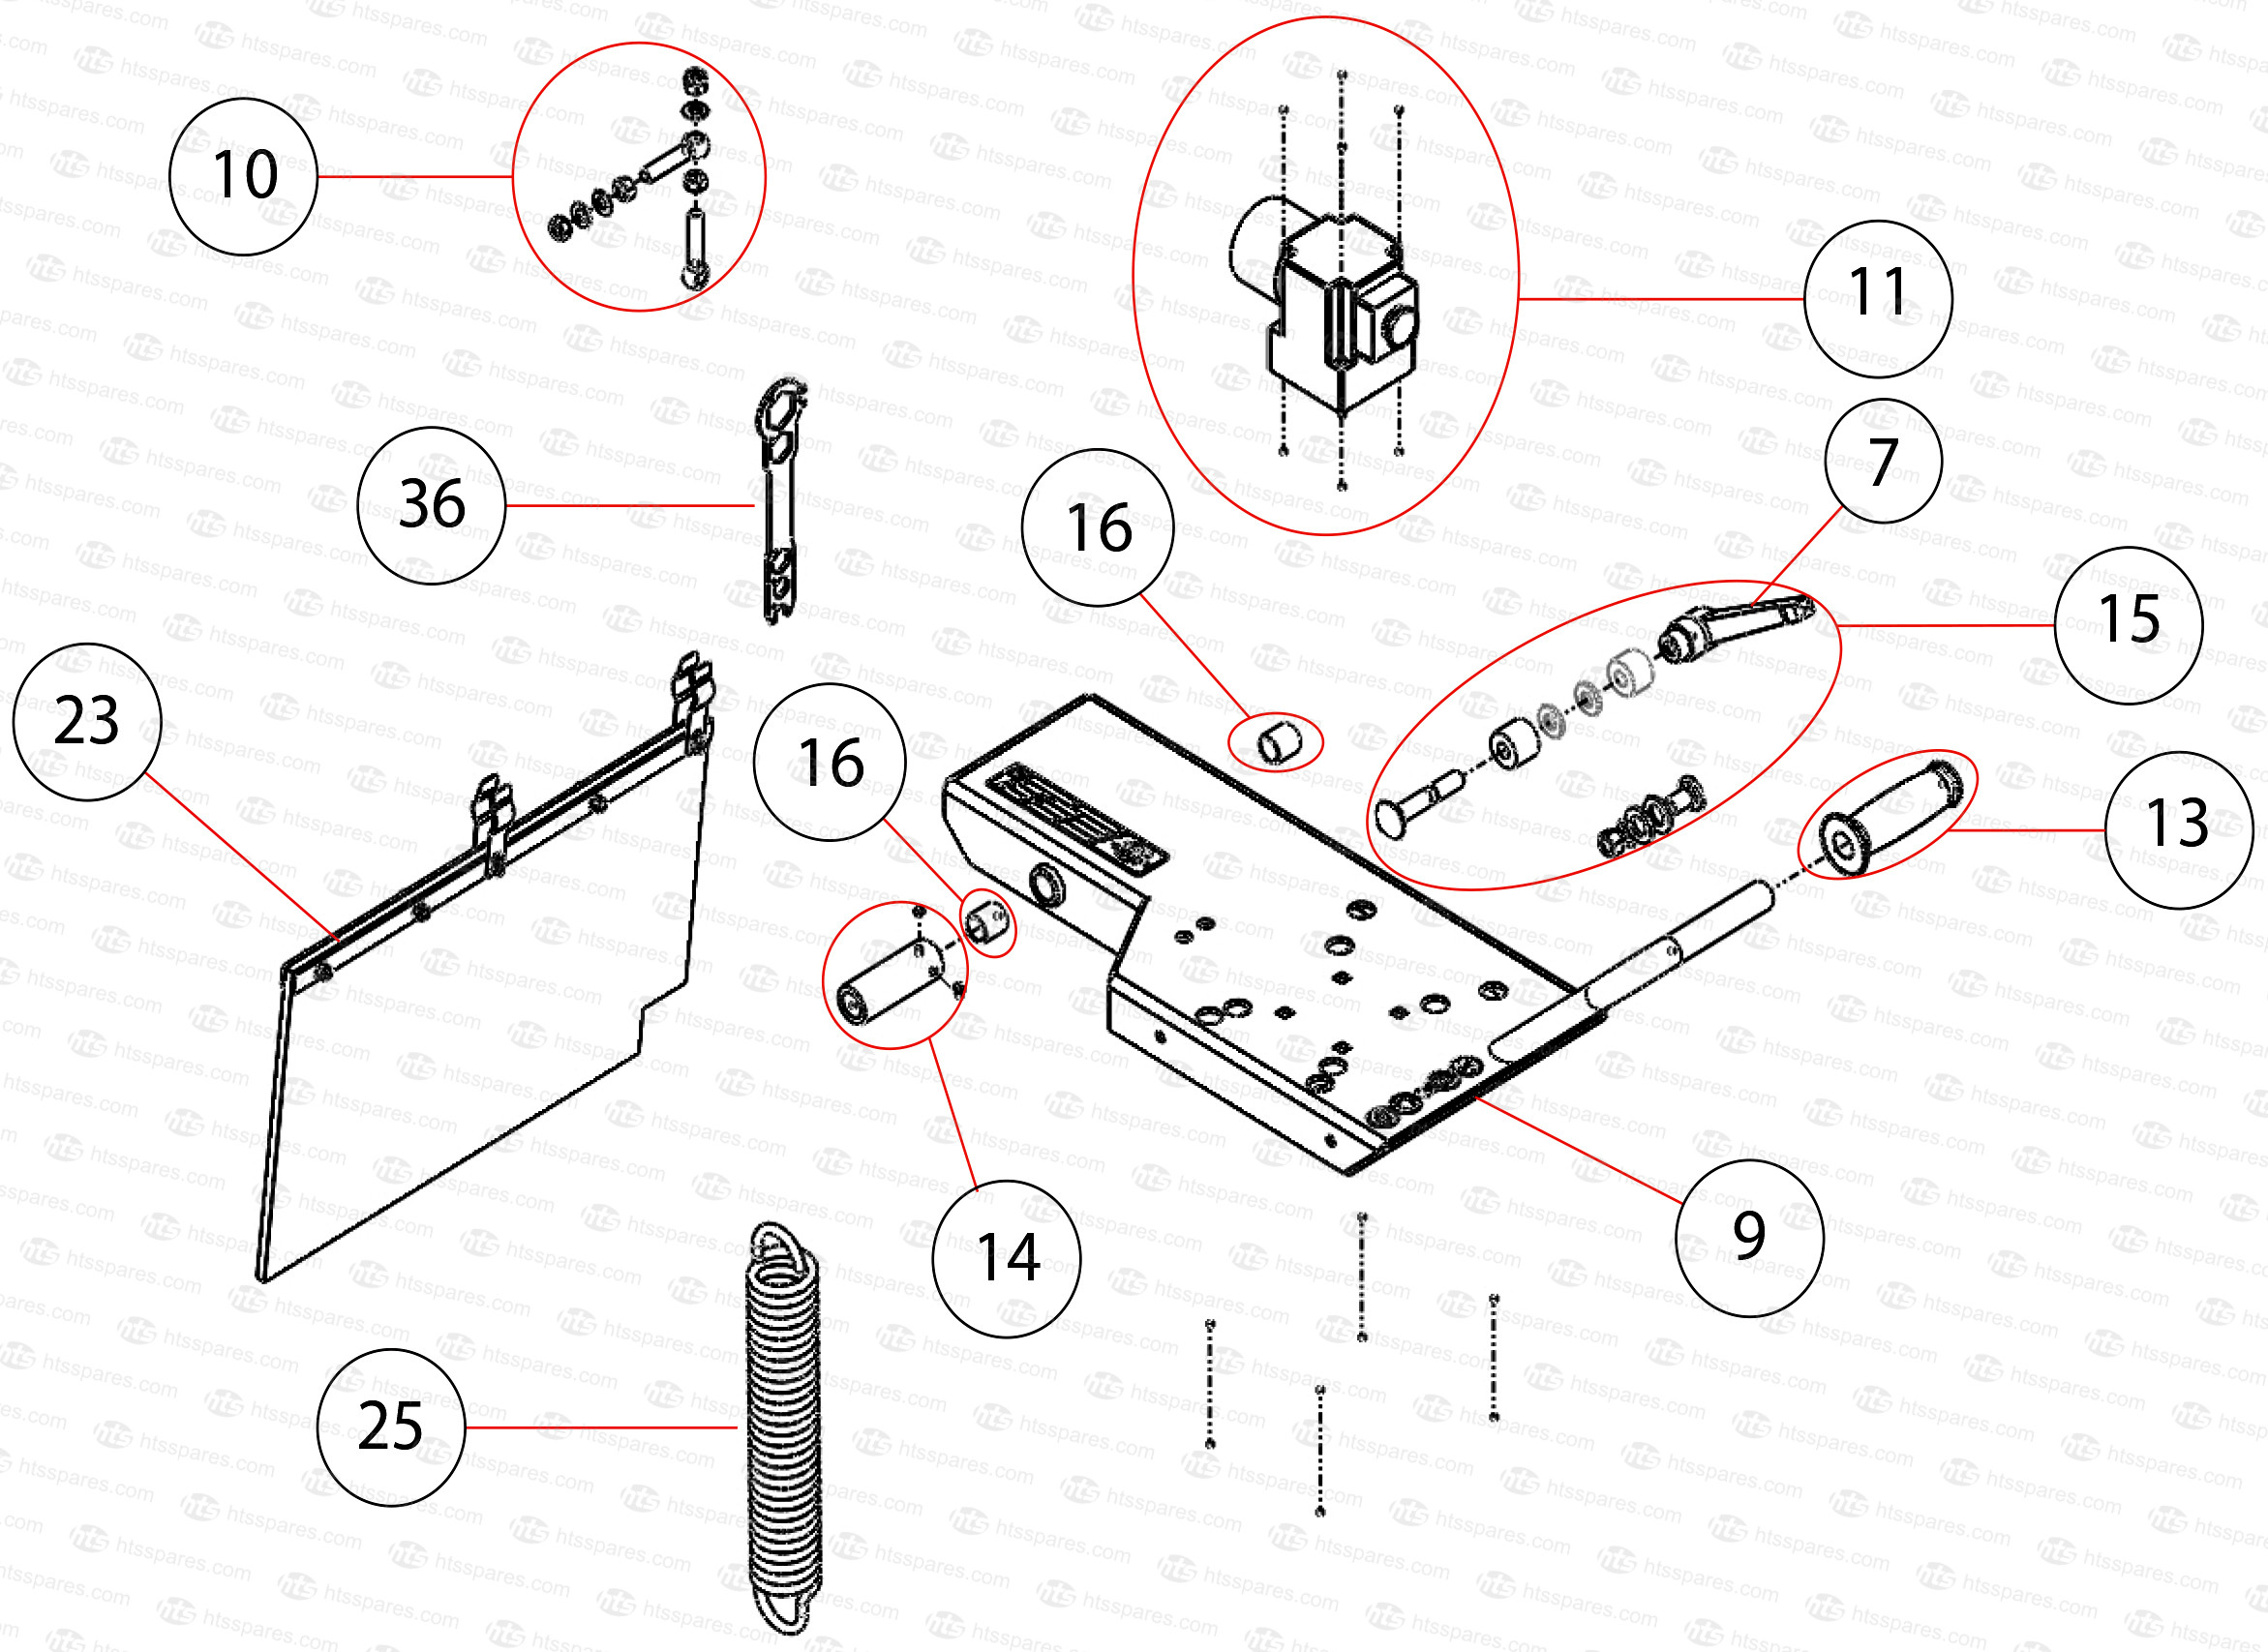 Norton Clipper Wiring Diagram - Wiring Diagram Go on